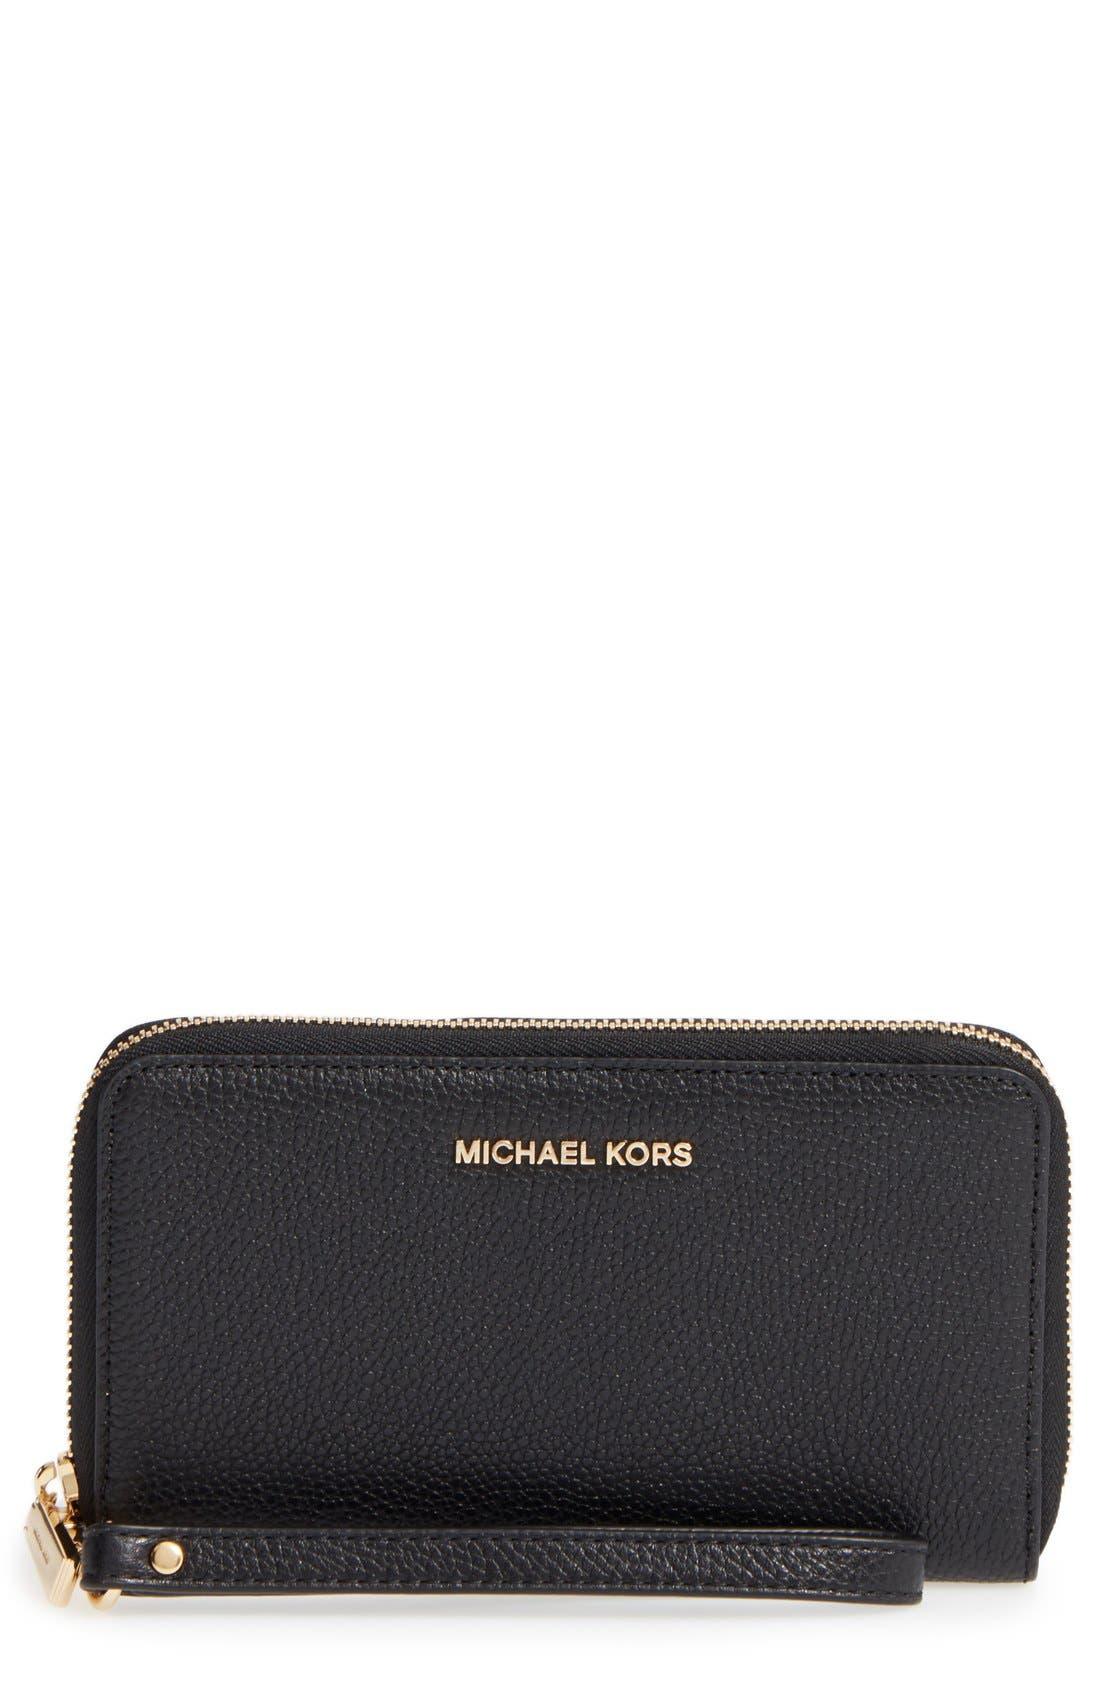 Alternate Image 1 Selected - MICHAEL Michael Kors Mercer Large Leather Tech Wristlet